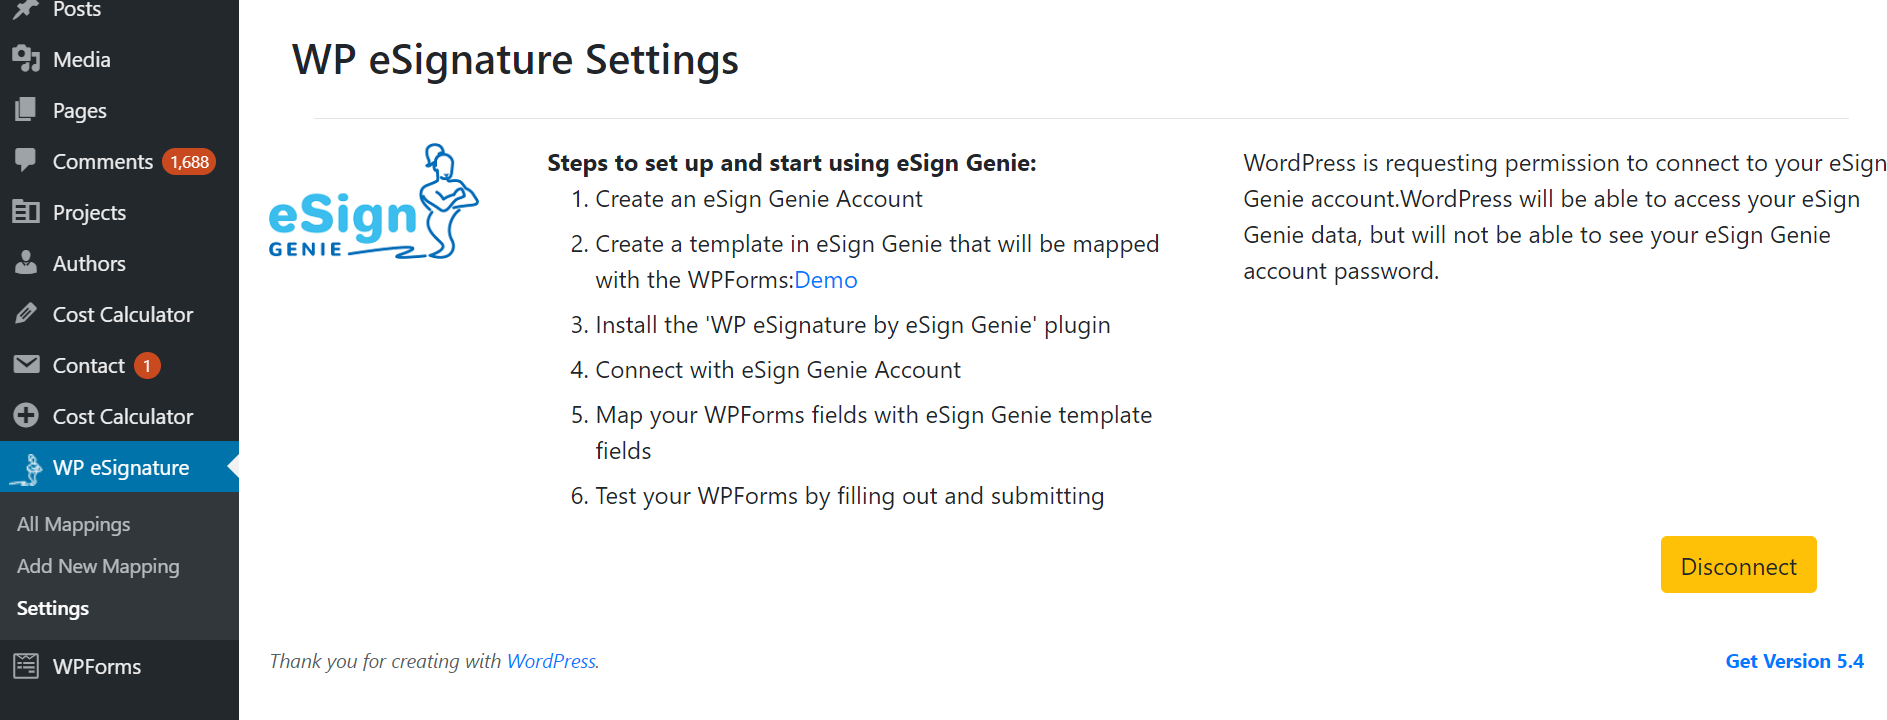 Screenshot displaying WP eSignature settings page